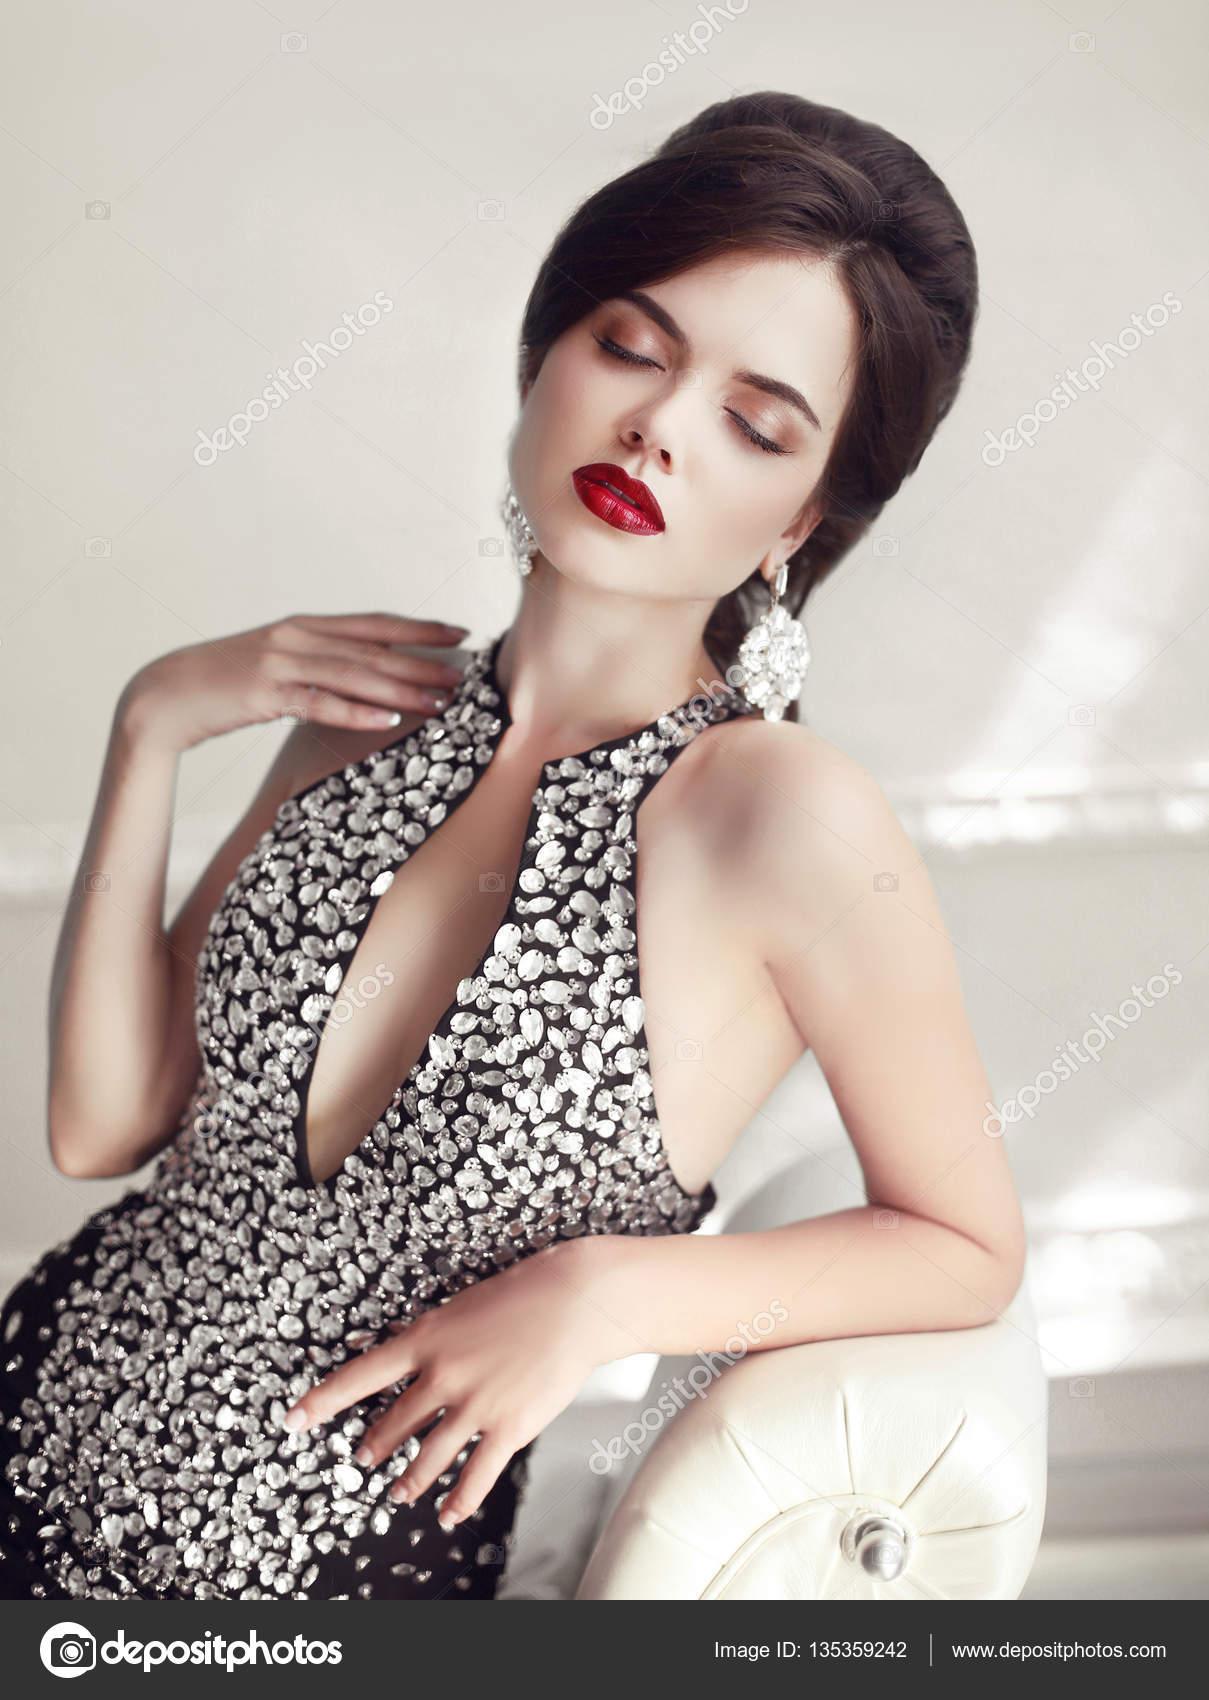 Joyeria De La Manera Elegante Retrato De Belleza De Mujer Peinado